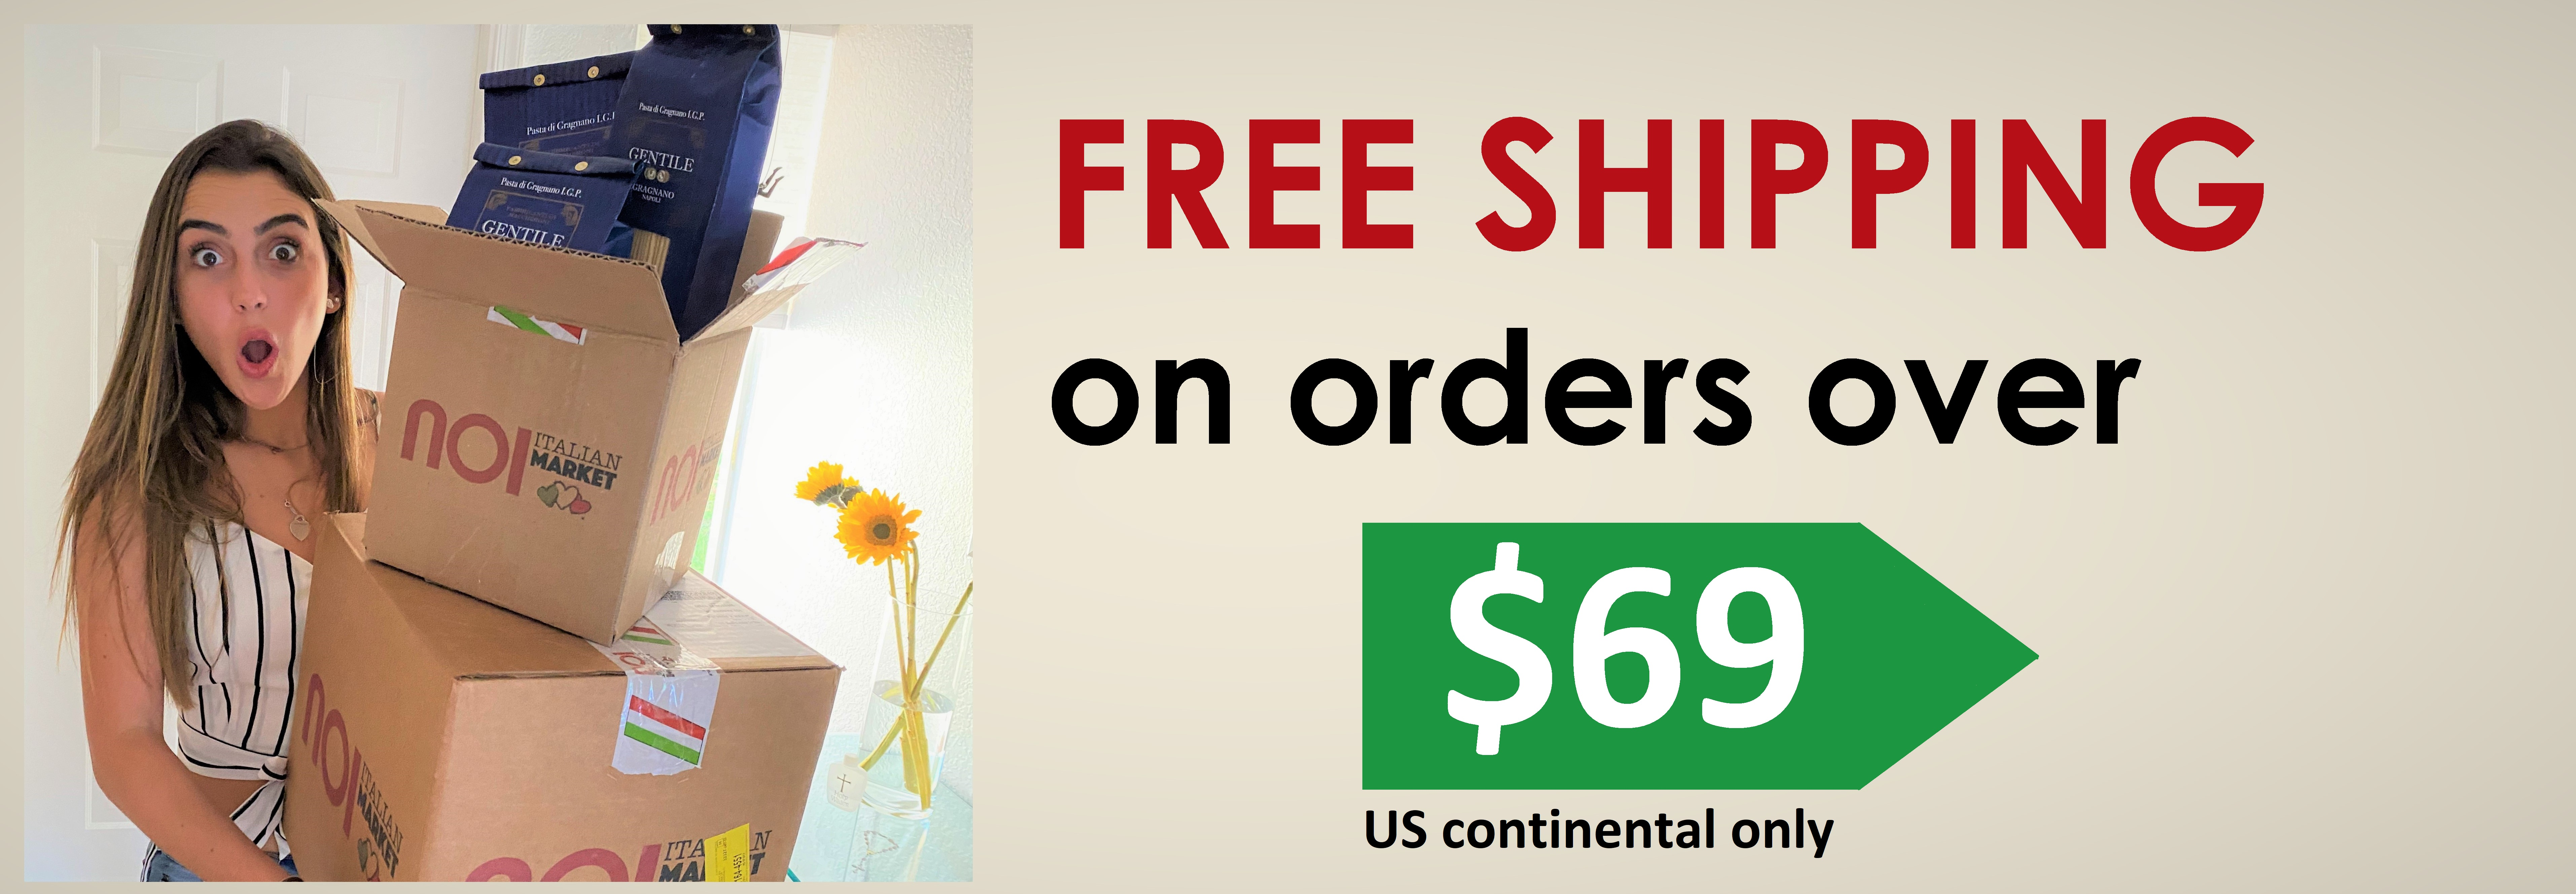 free-shipping-2-.jpg